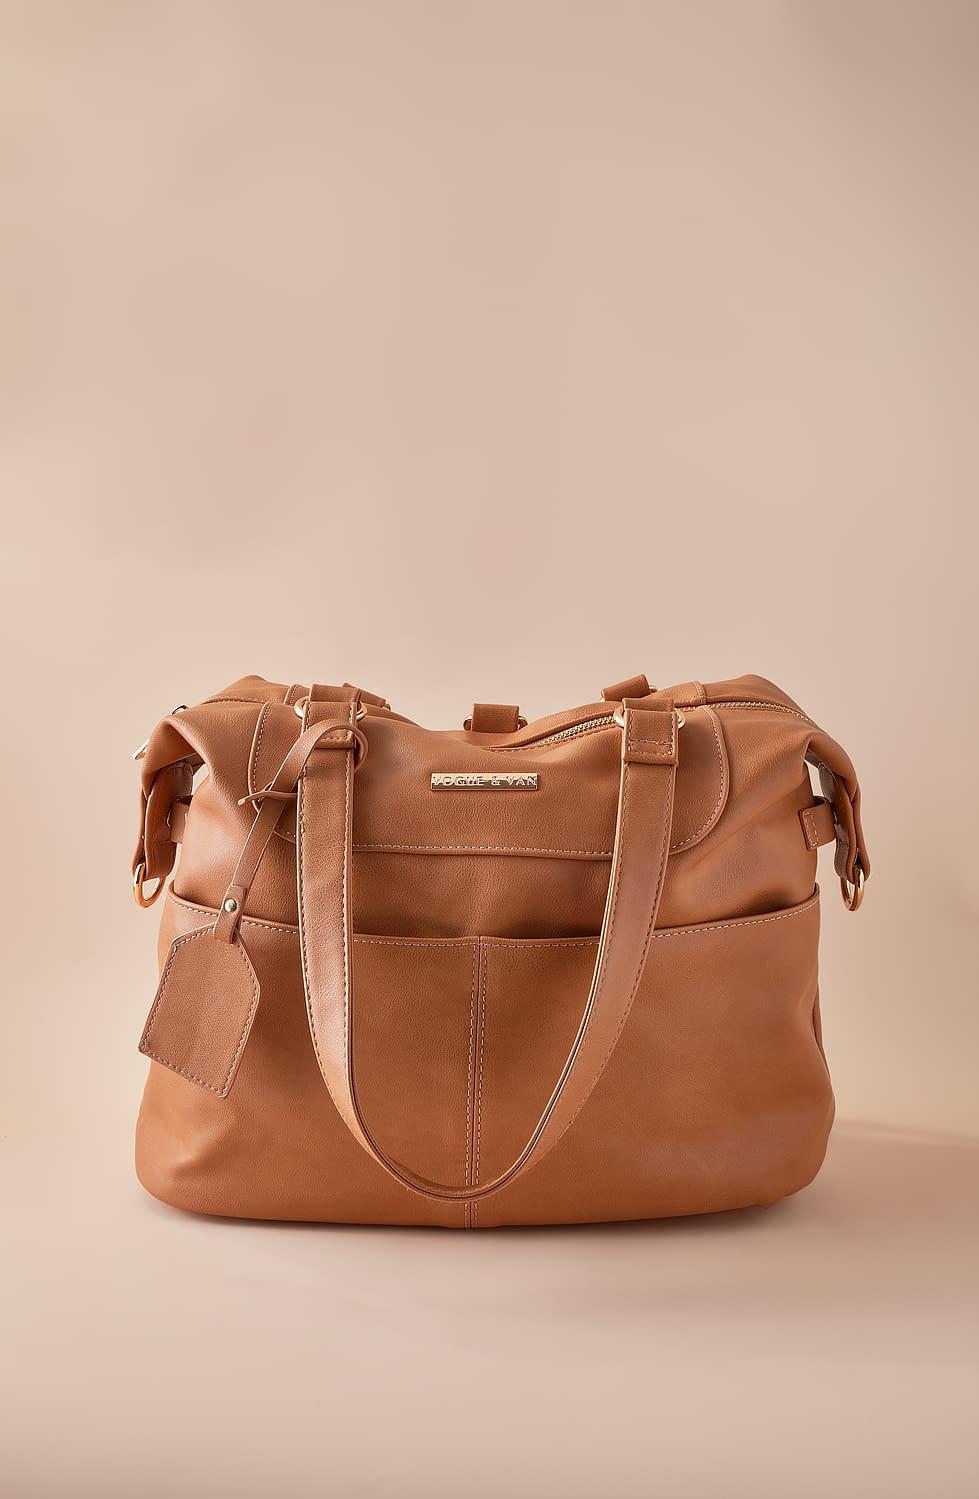 Minimal product photography - Bag